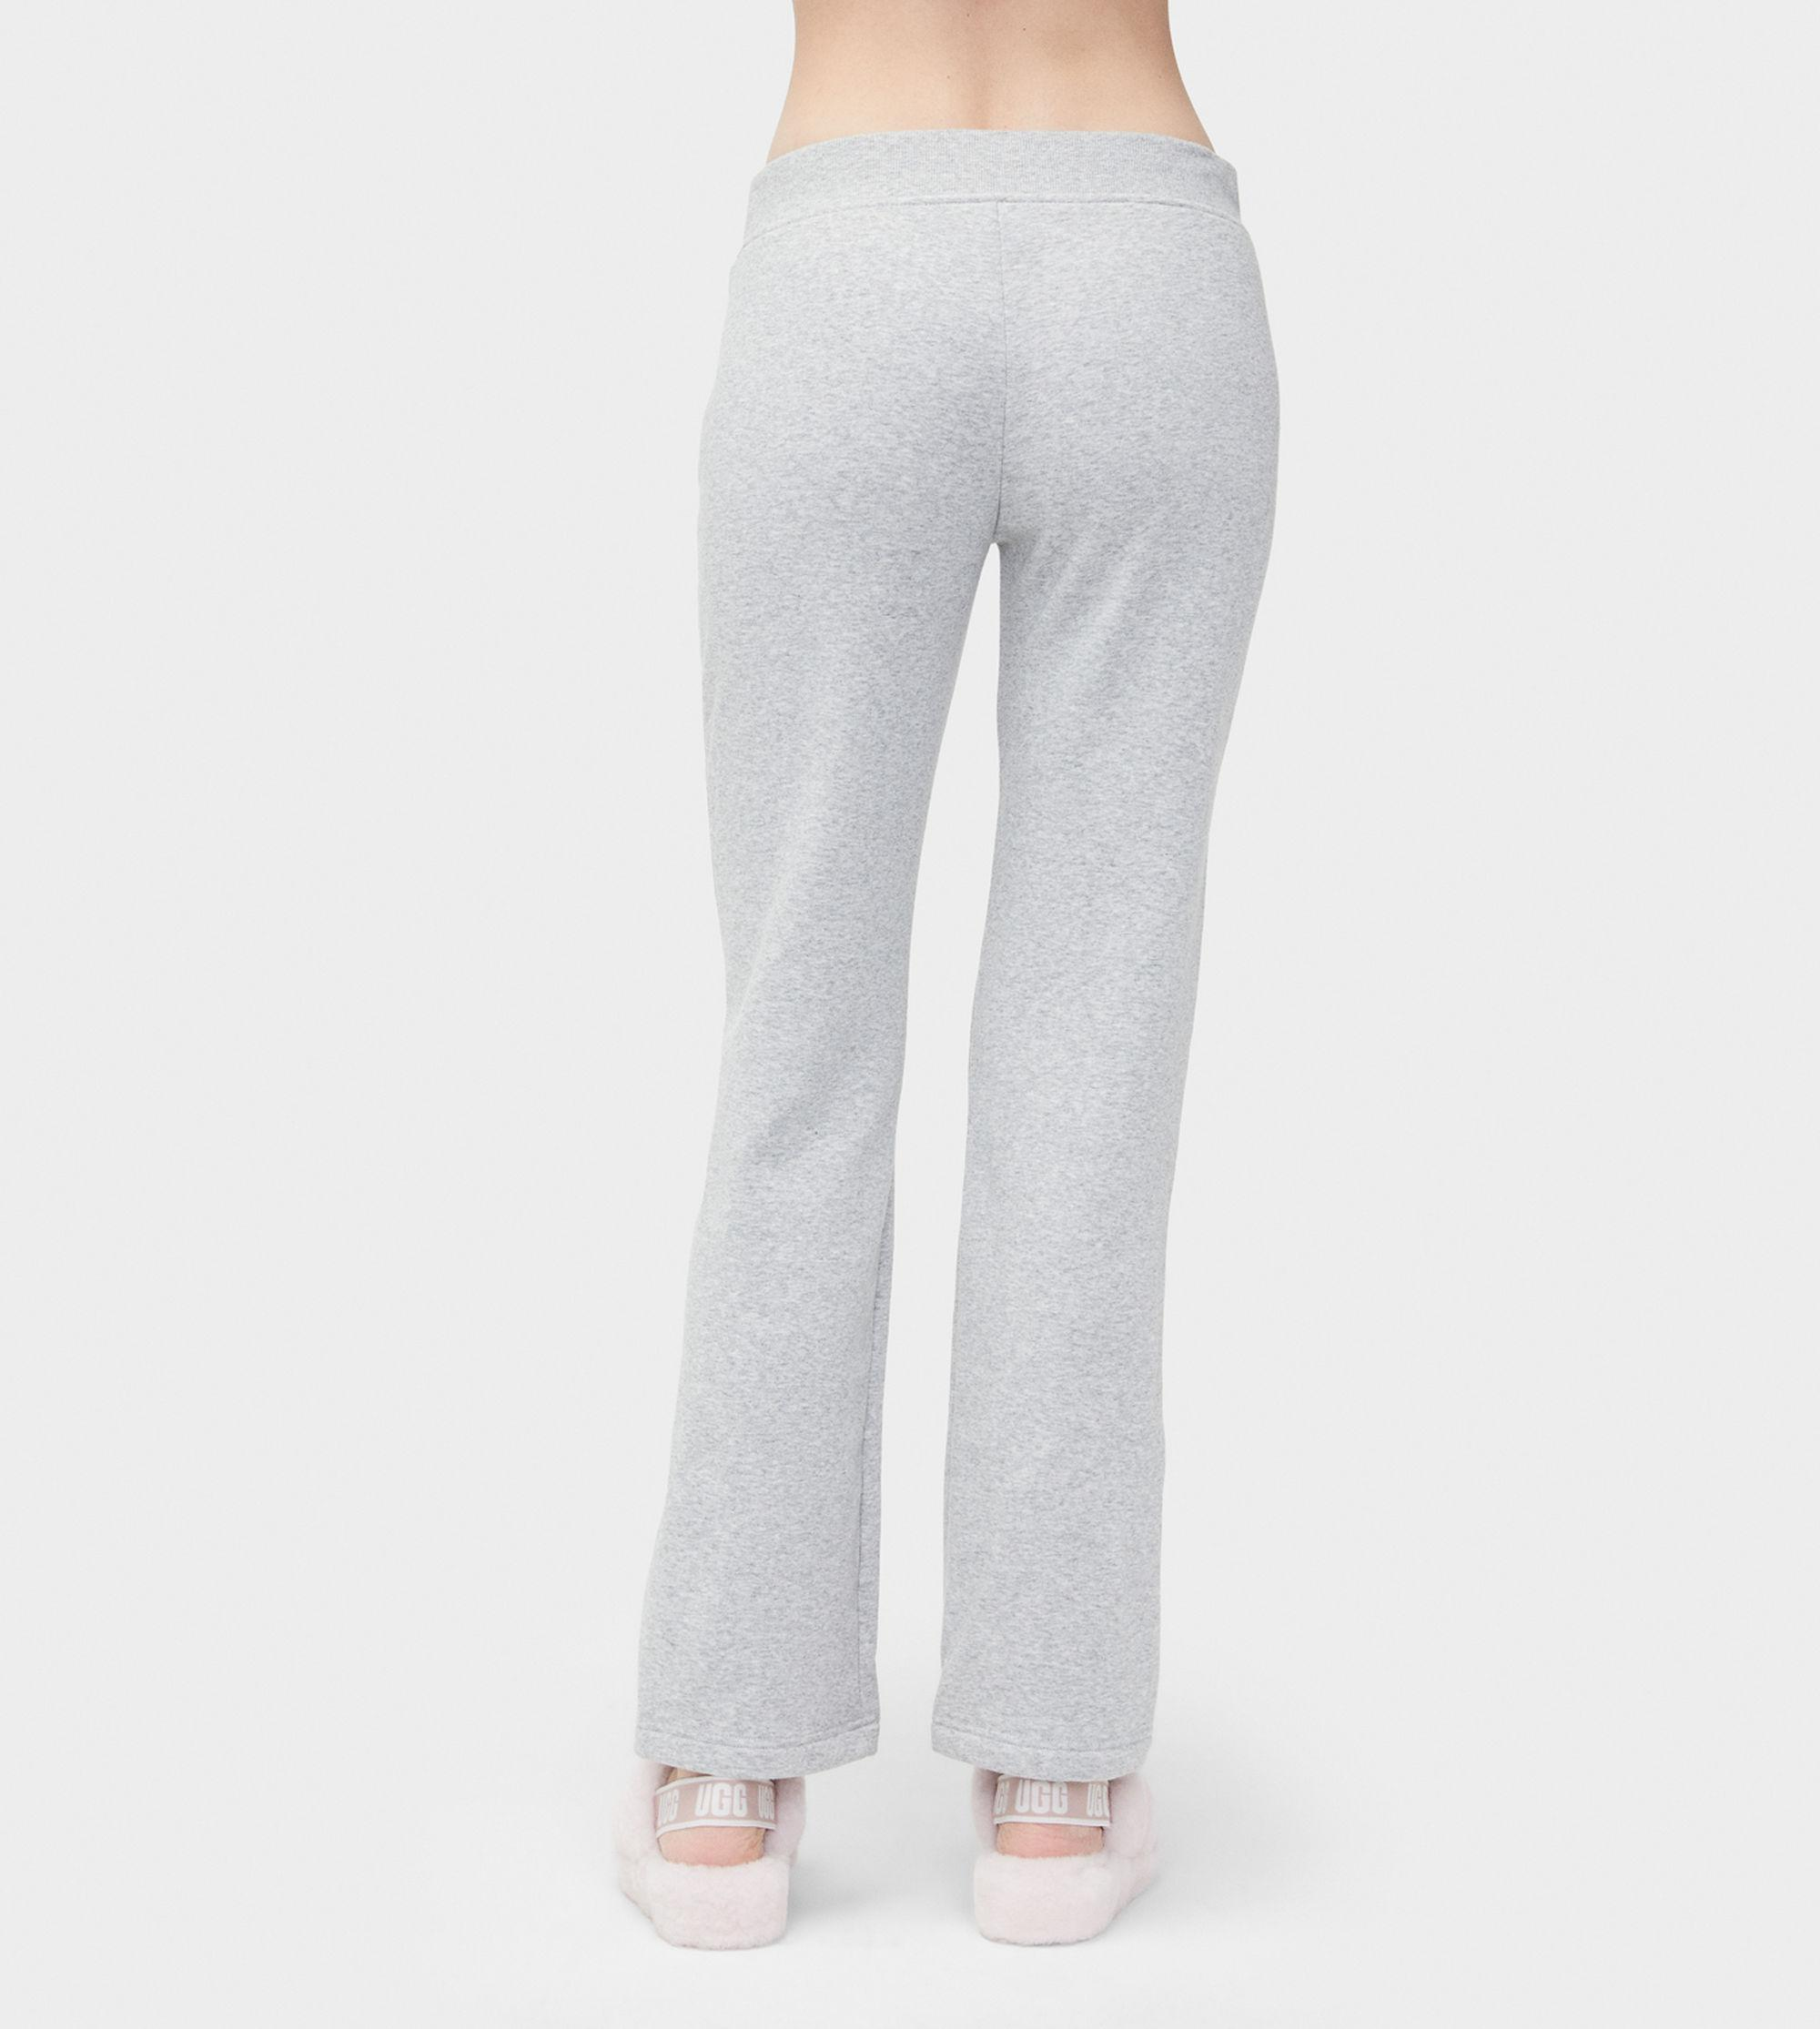 Lyst - UGG Penny Pants Penny Pants Clara Hoodie in Gray 61675913e